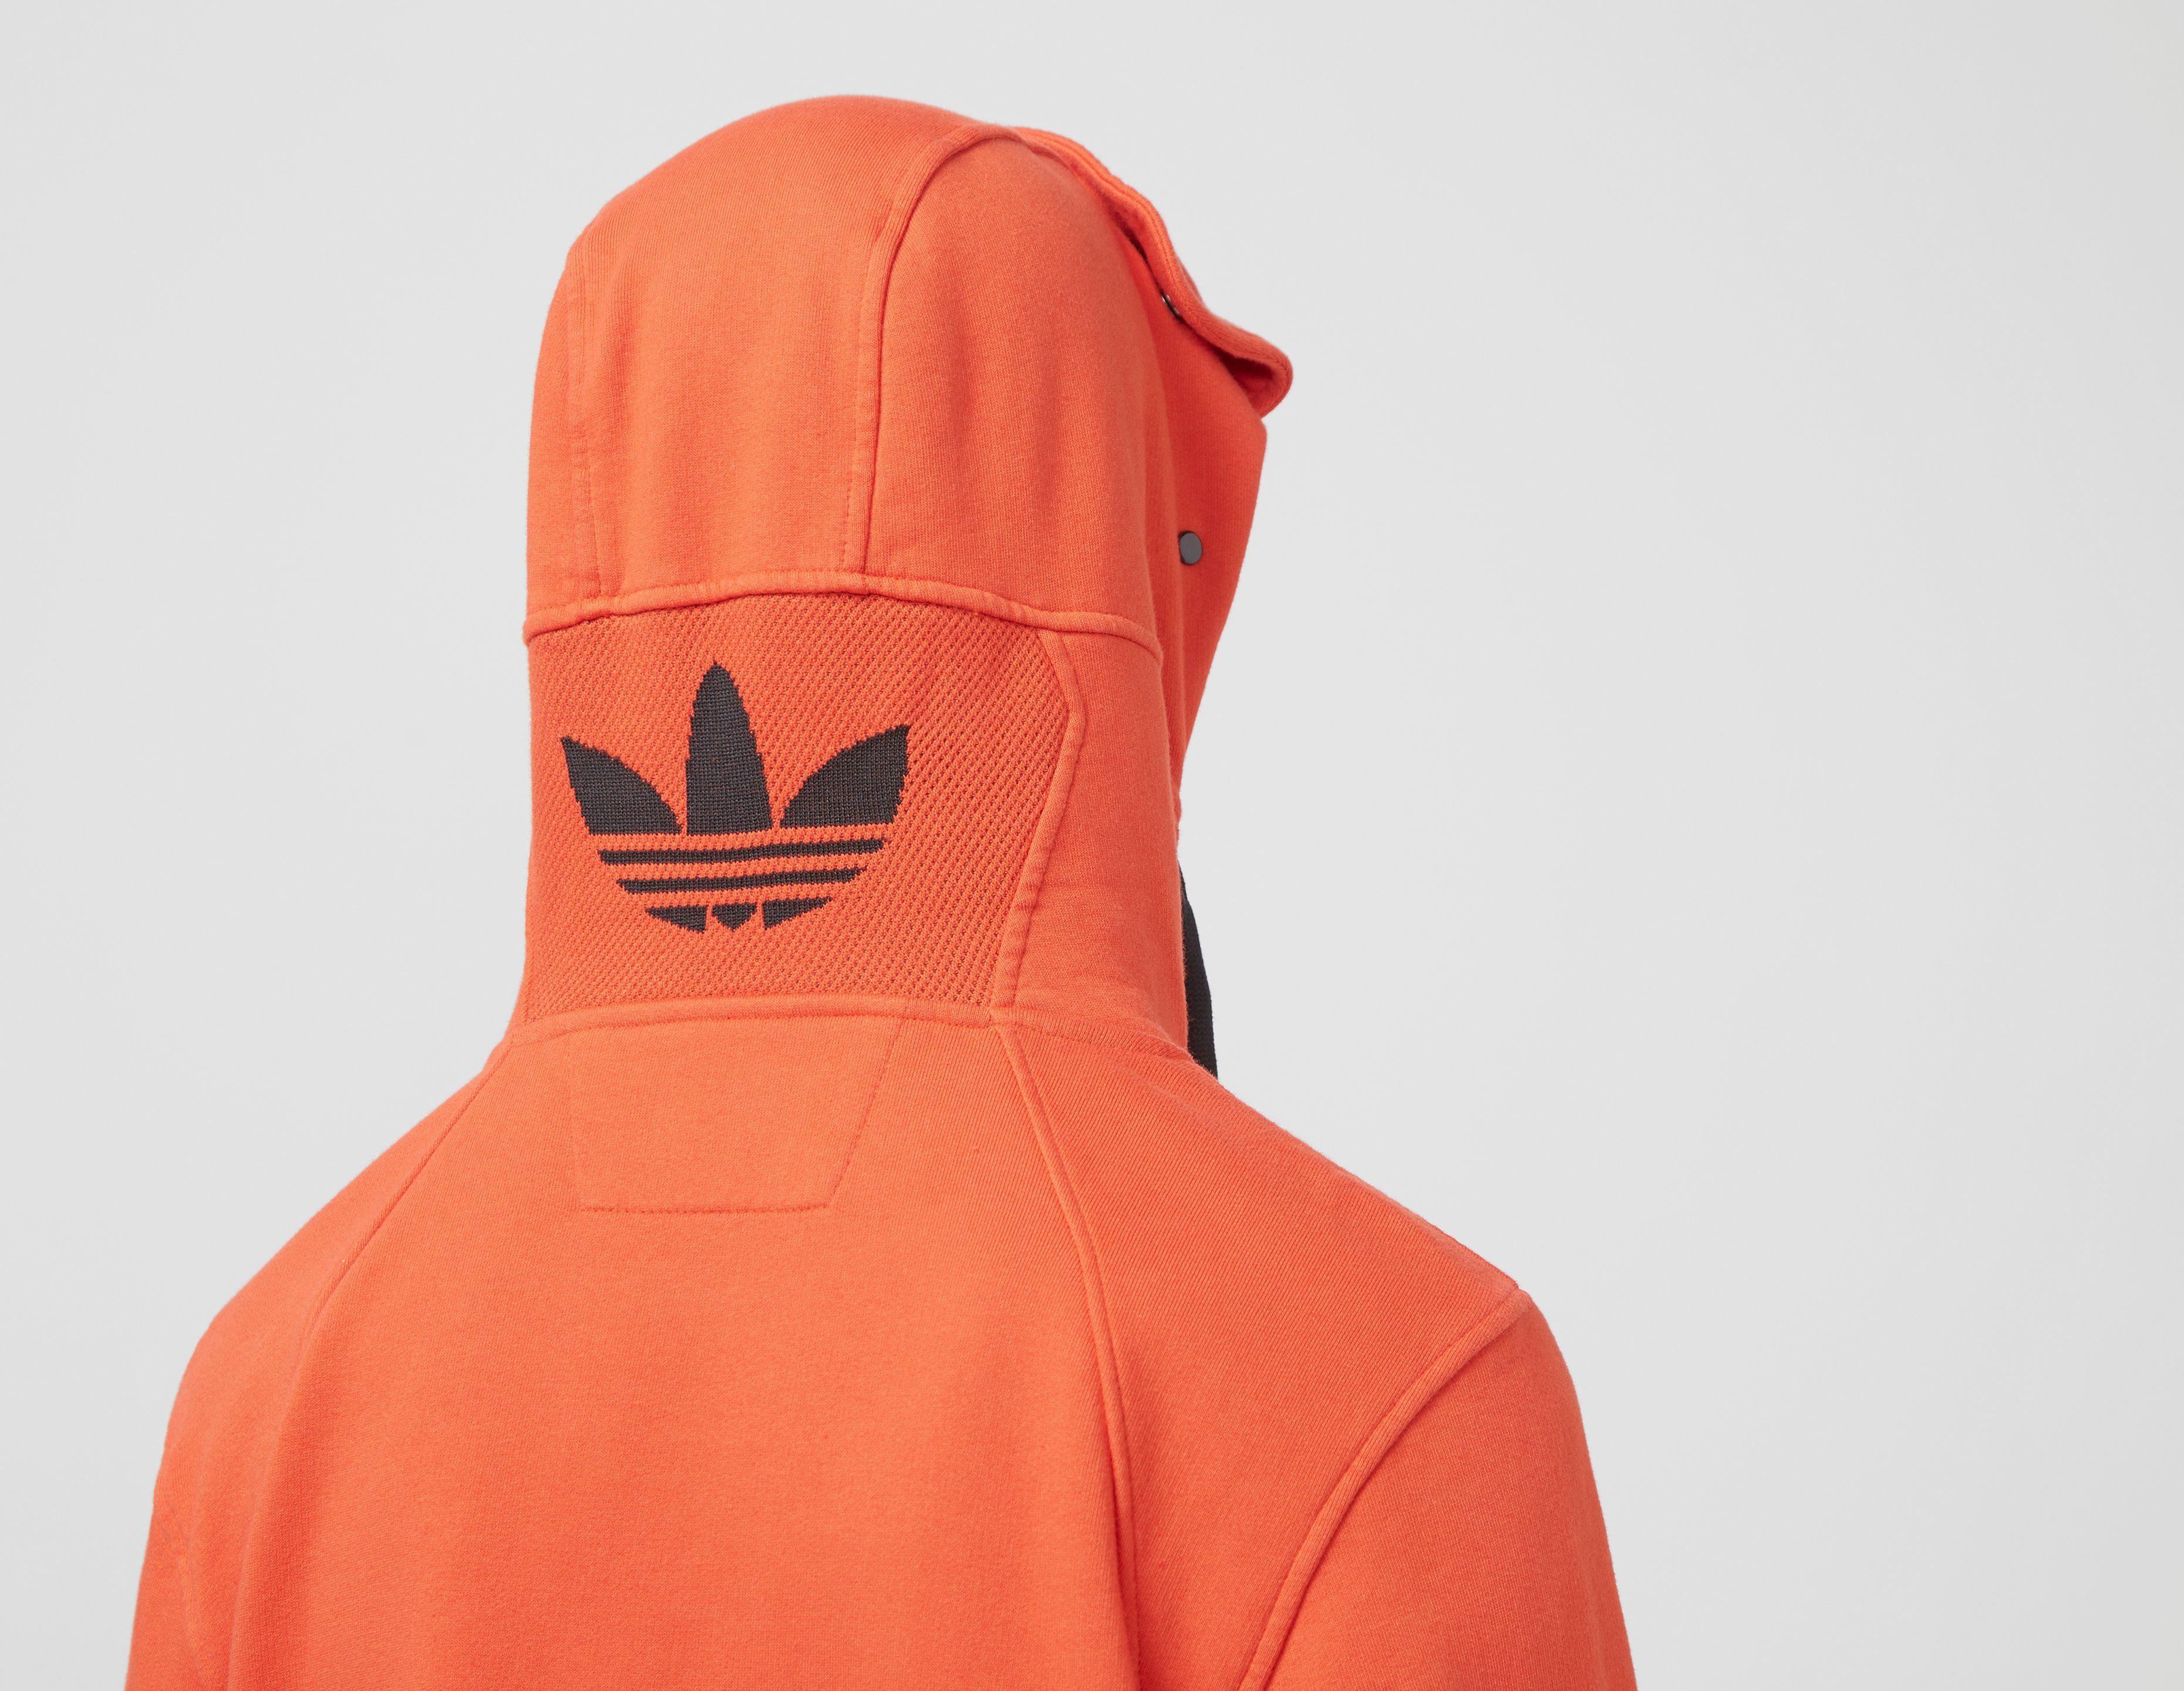 adidas Originals x C.P. Company Hoody